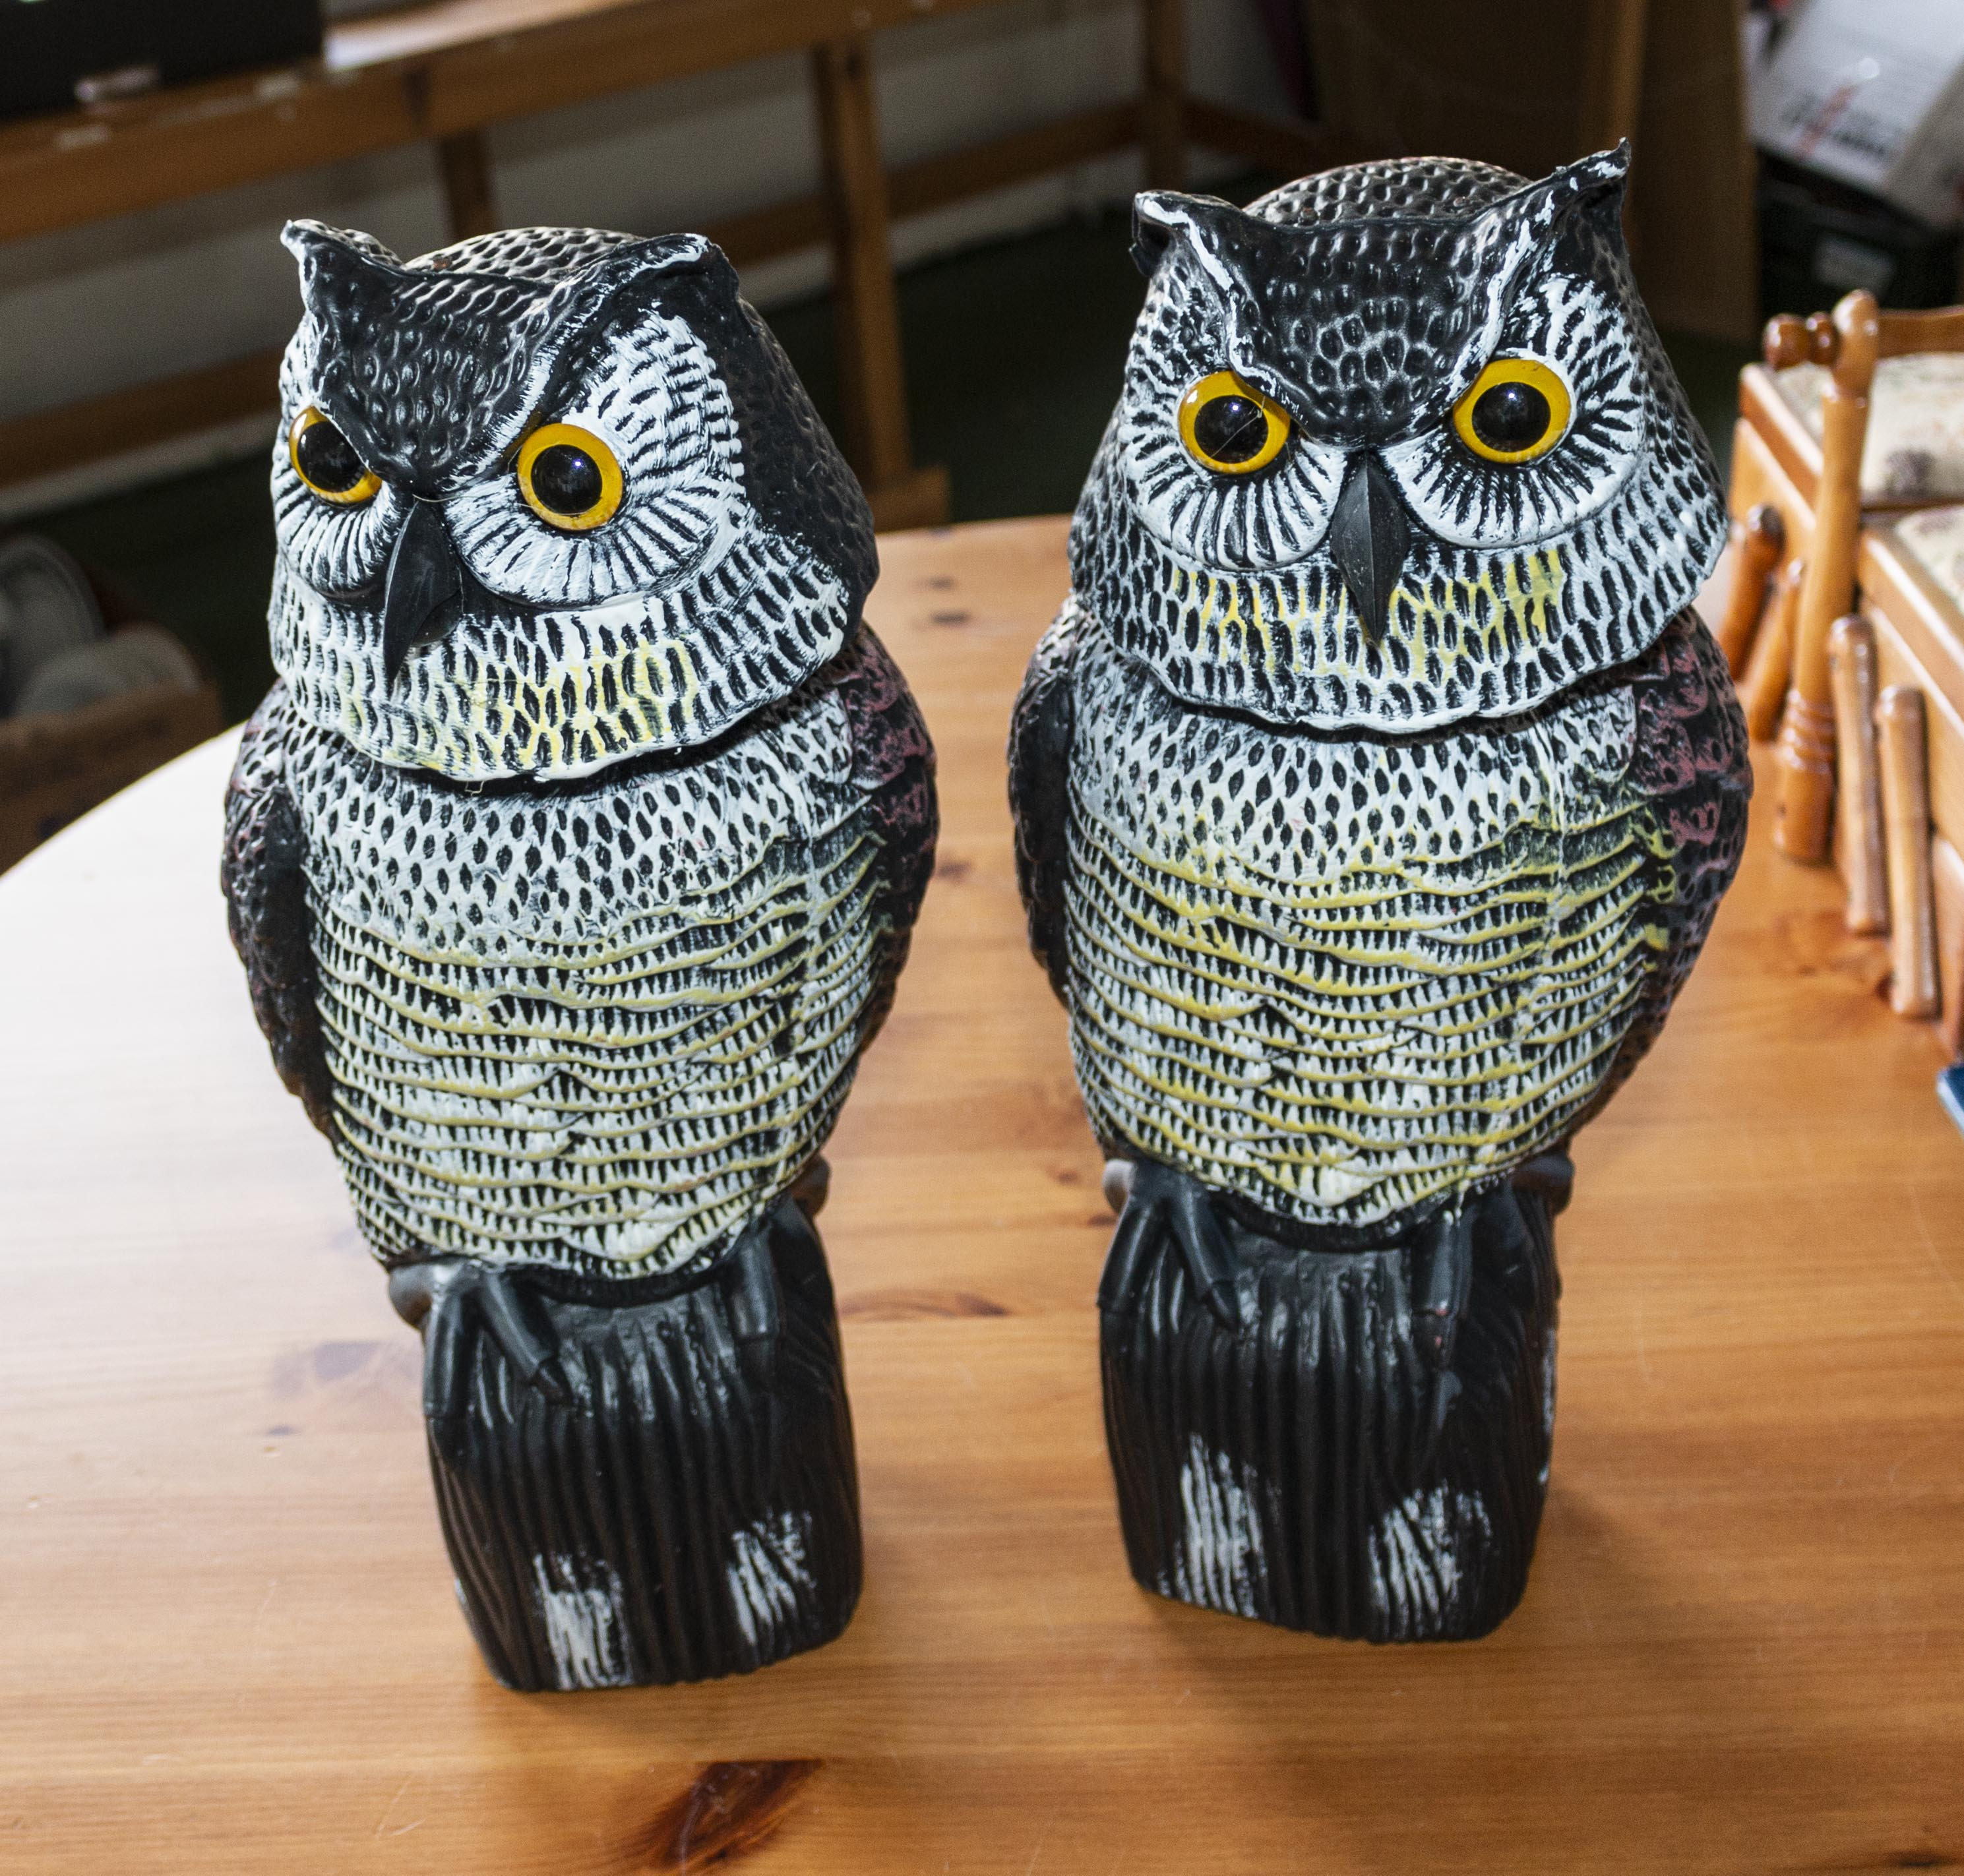 Lot 49 - Two plastic owl garden ornaments